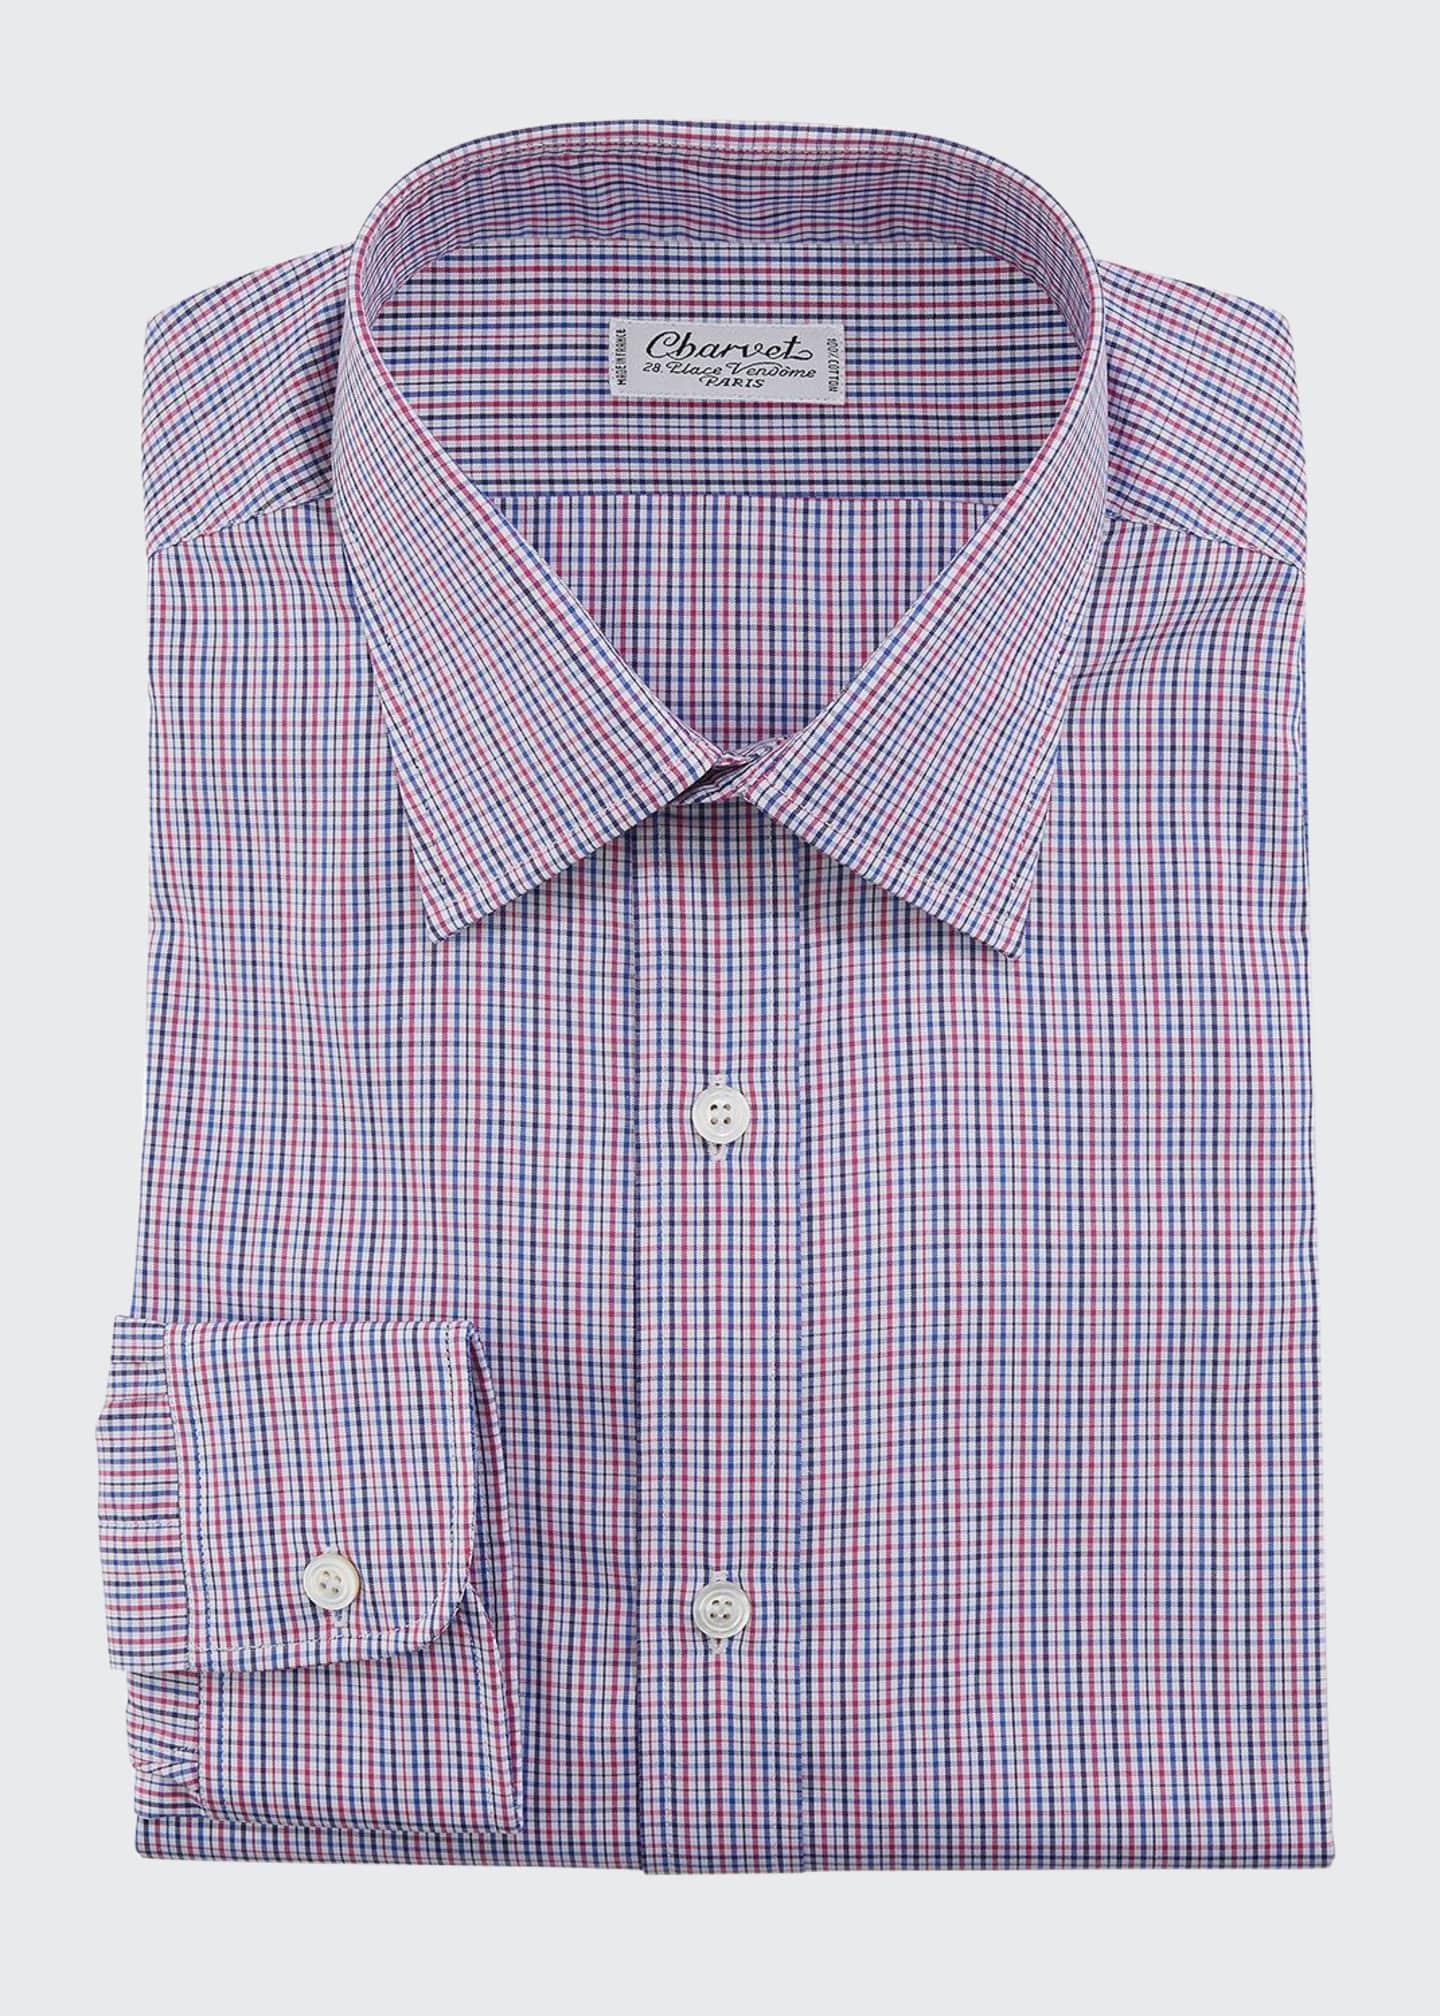 Charvet Men's Two-Tone Checker Cotton Dress Shirt